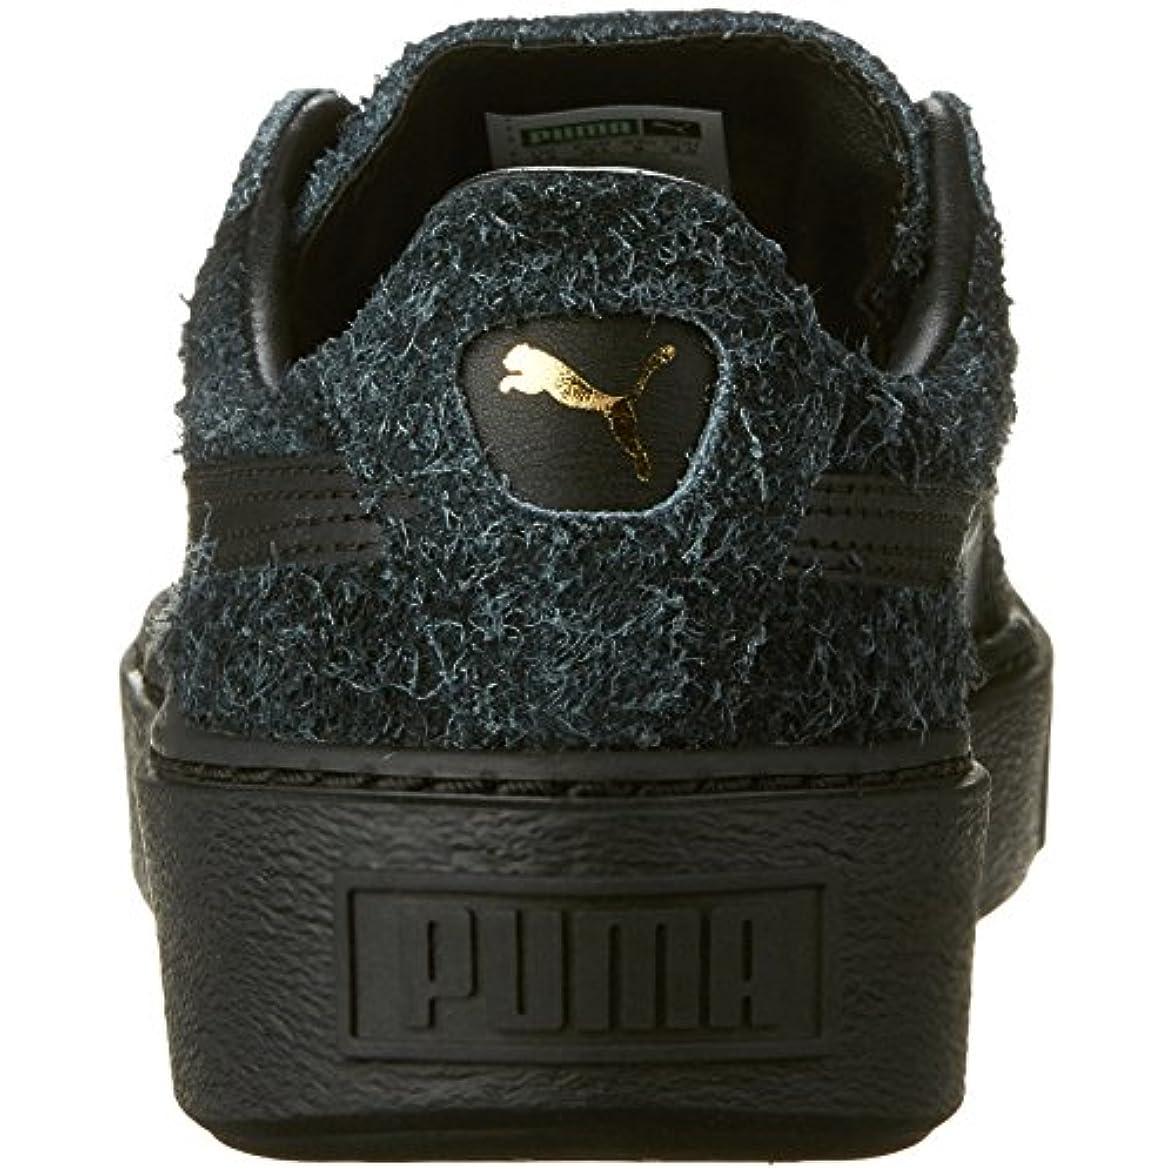 Puma Suede Platform Elemental Black-black-puma Black womens 10 B m Us